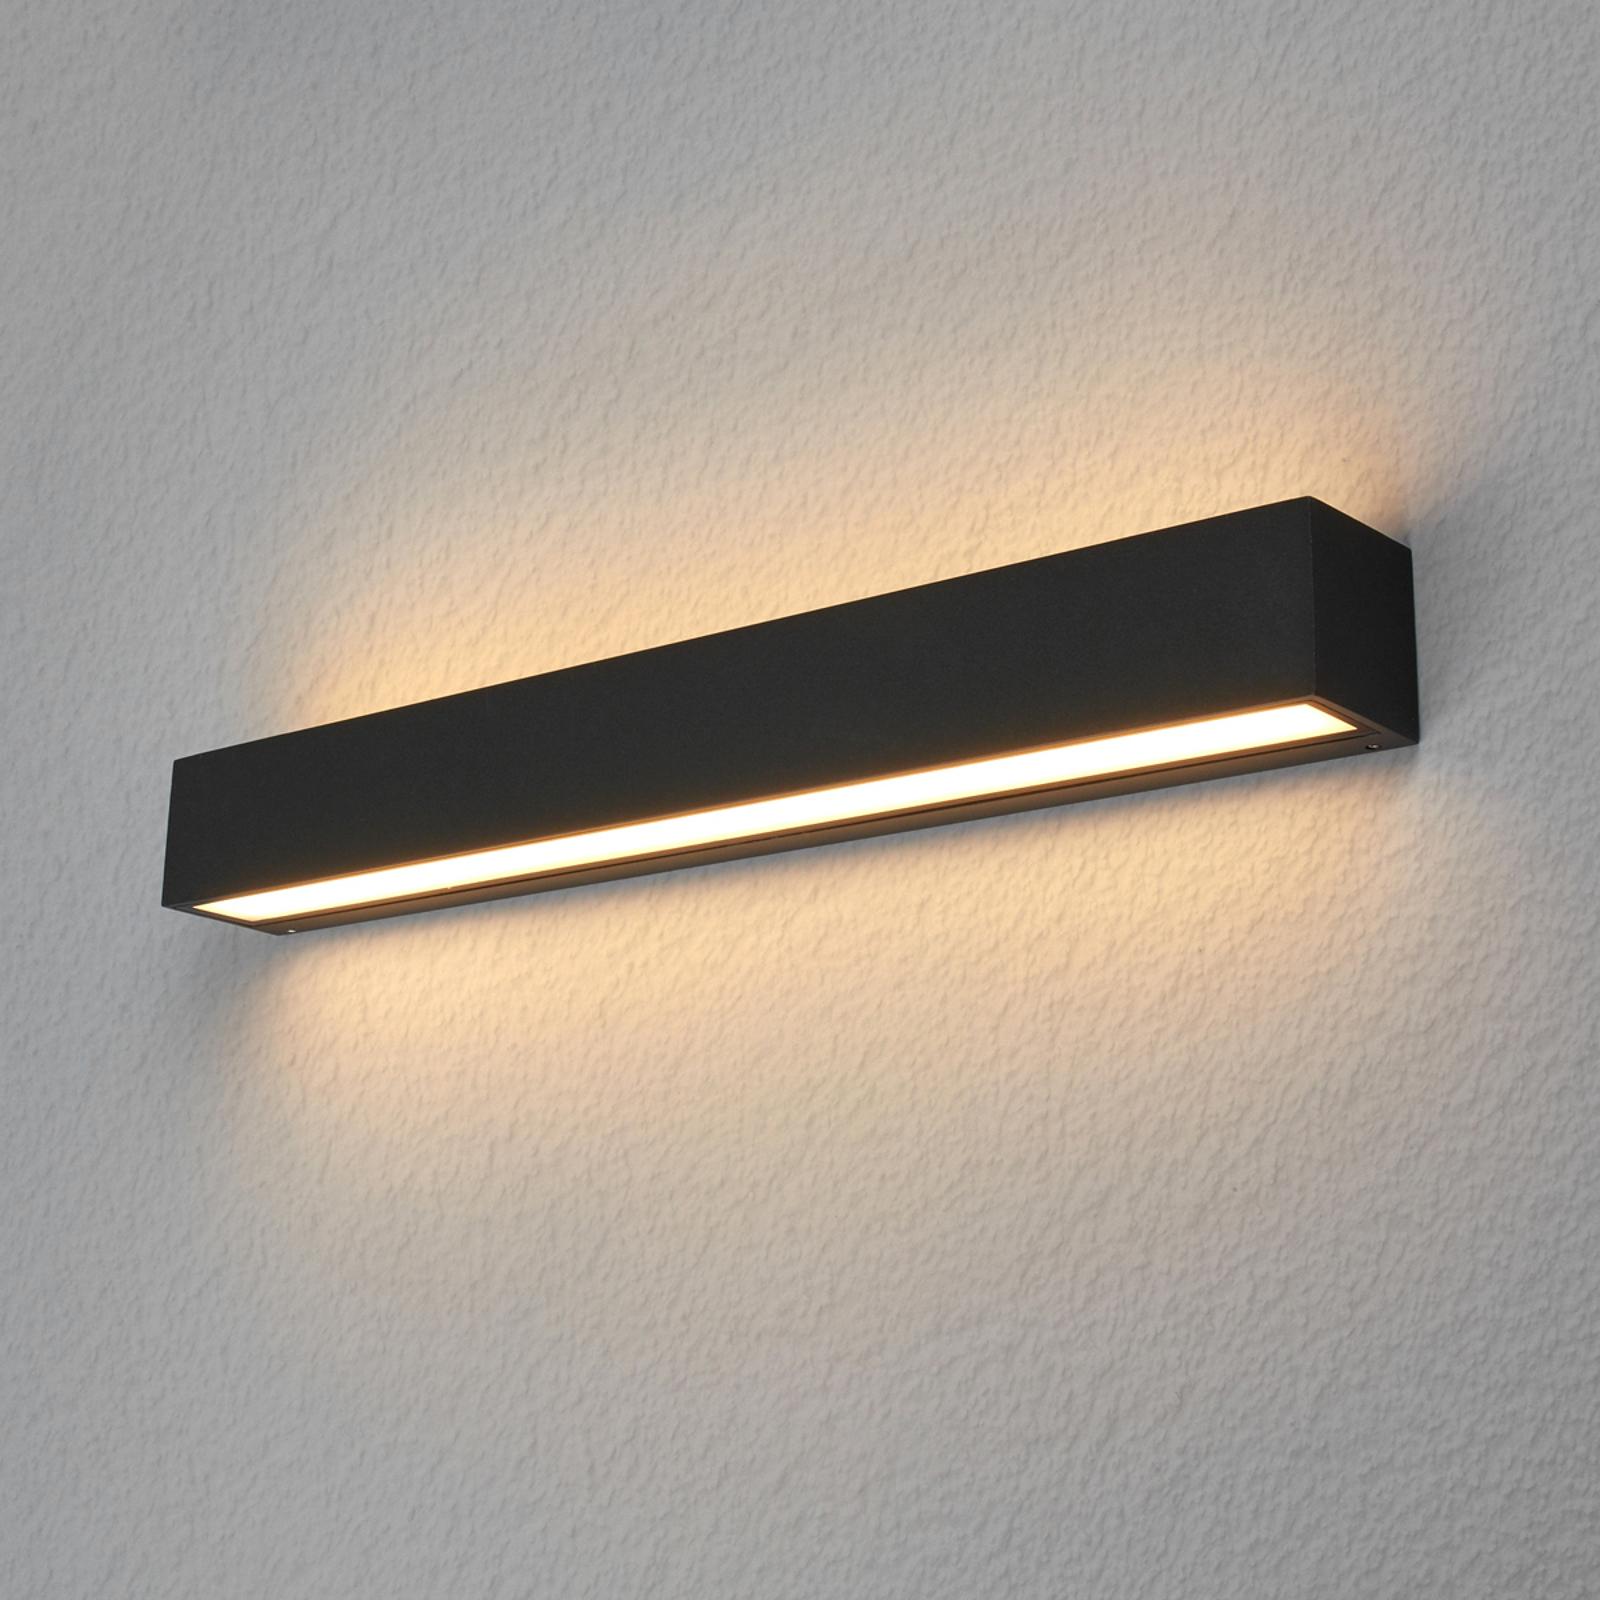 Lucande Lengo LED-Wandlampe, 50 cm, grafit, 2-fl.